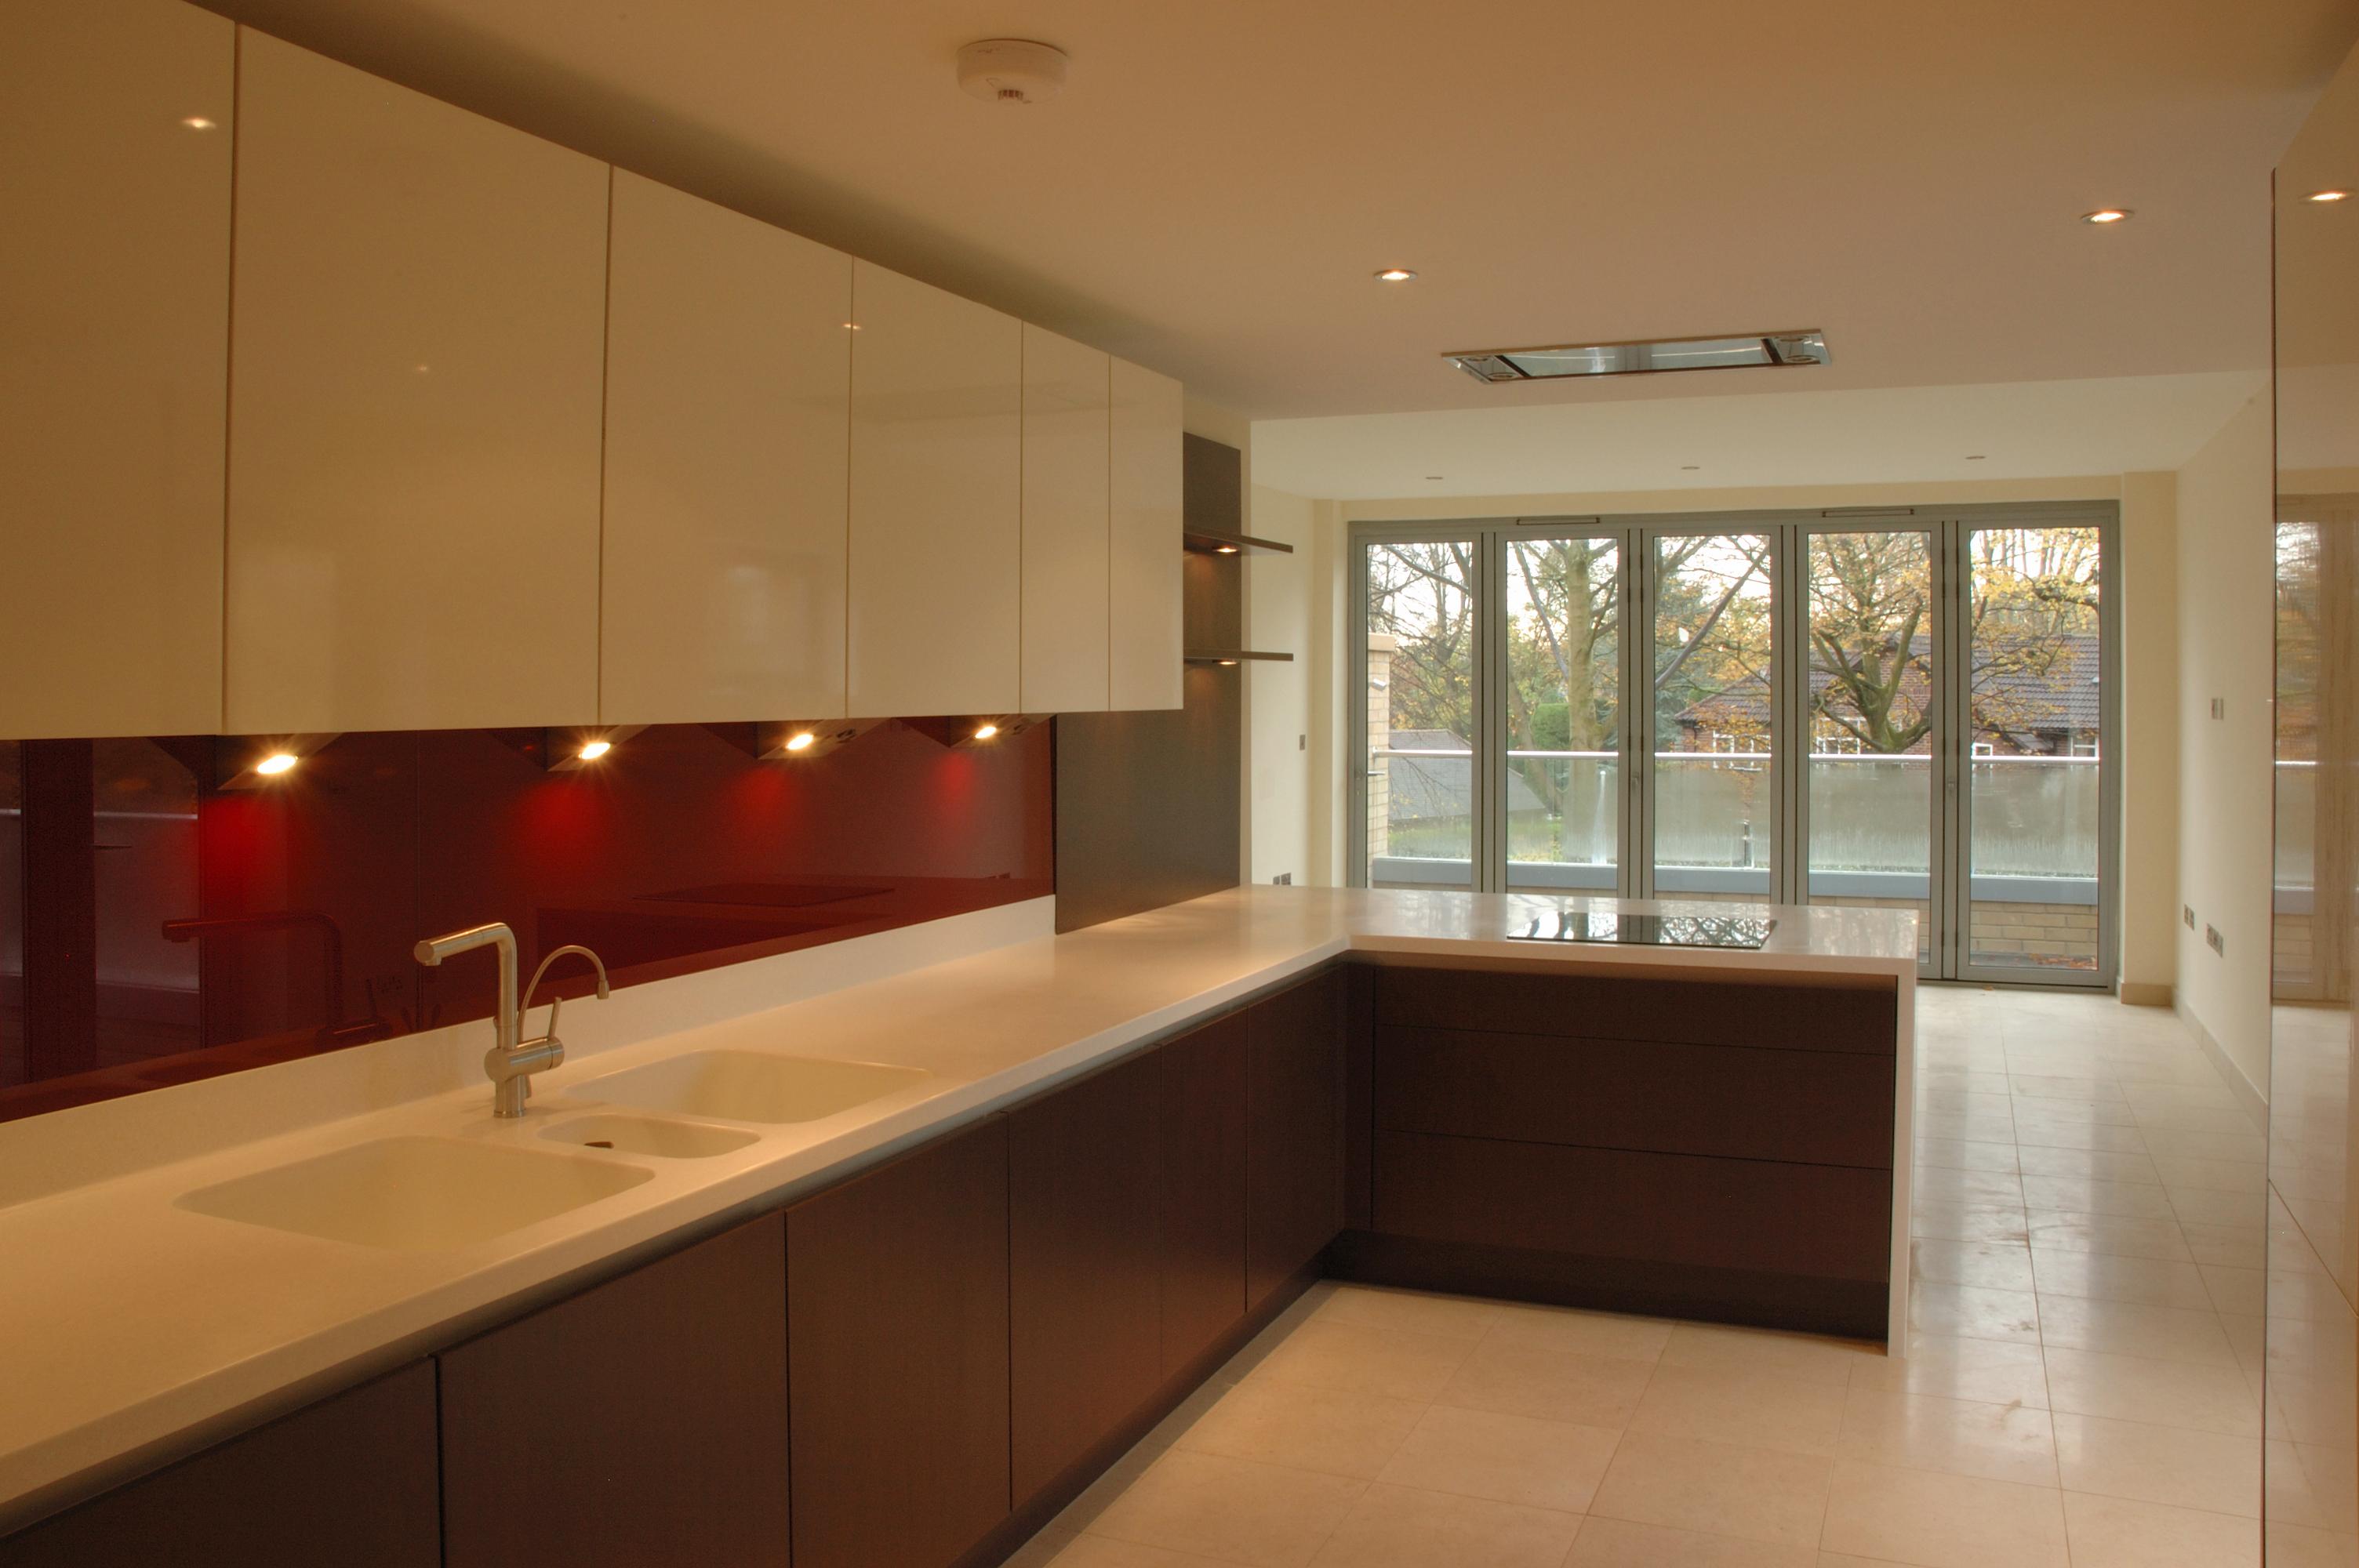 Amulree - Typical Kitchen